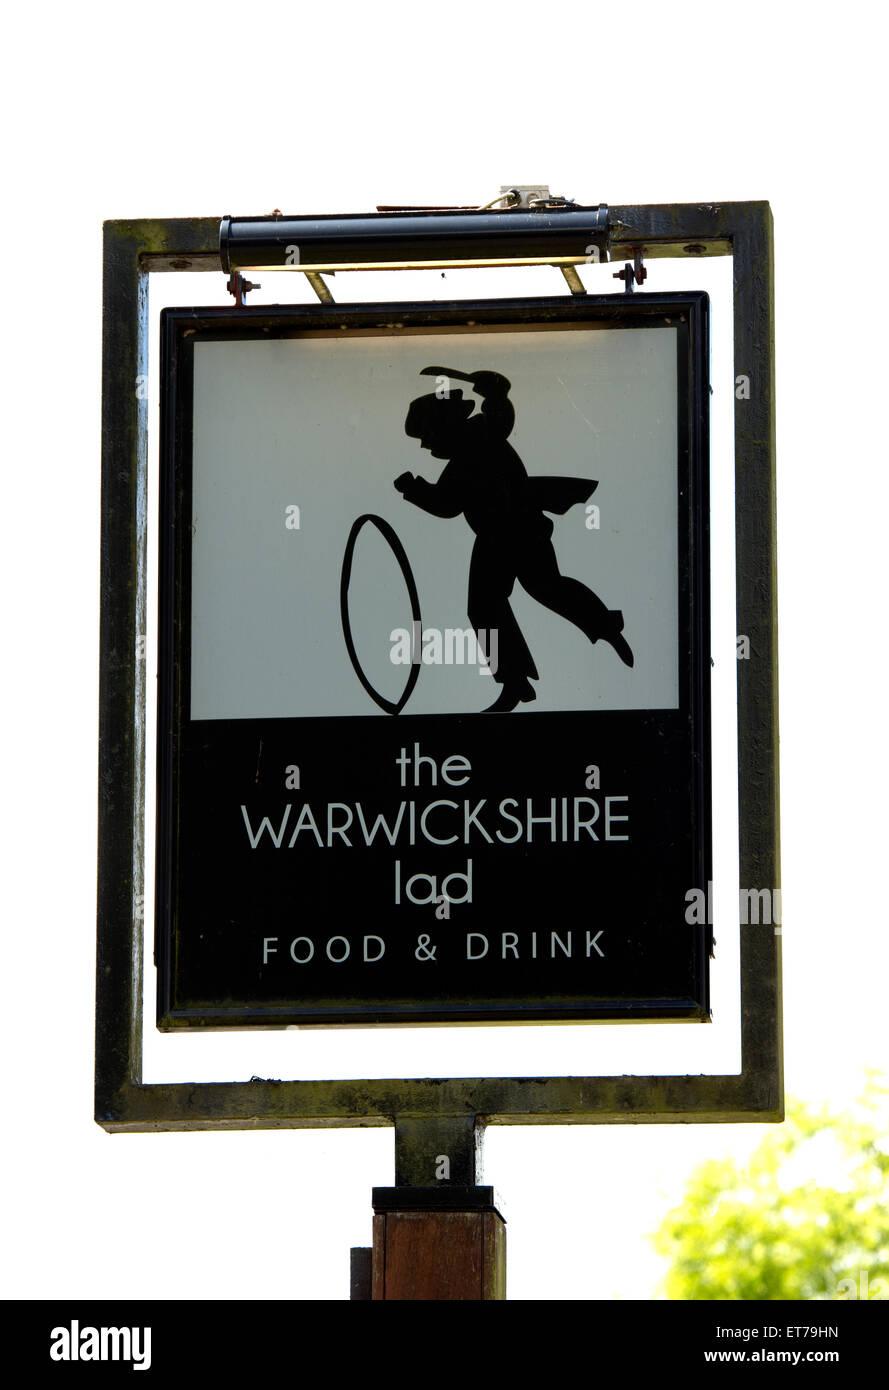 The Warwickshire Lad pub sign, Wood End, Warwickshire, England, UK - Stock Image